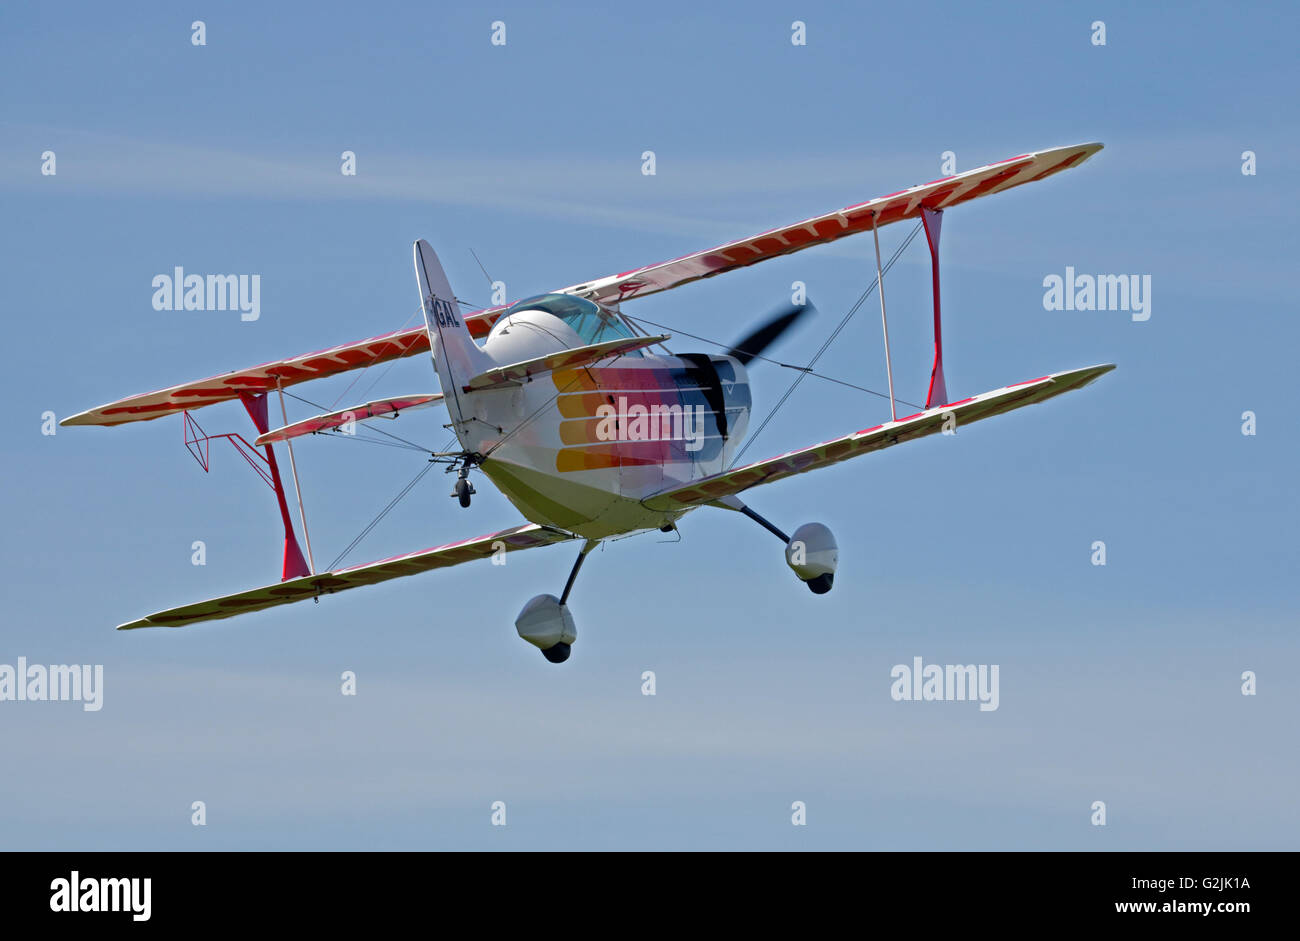 Chisten Eagle II Biplane, Goodwood Aerodrome, West Sussex, England - Stock Image